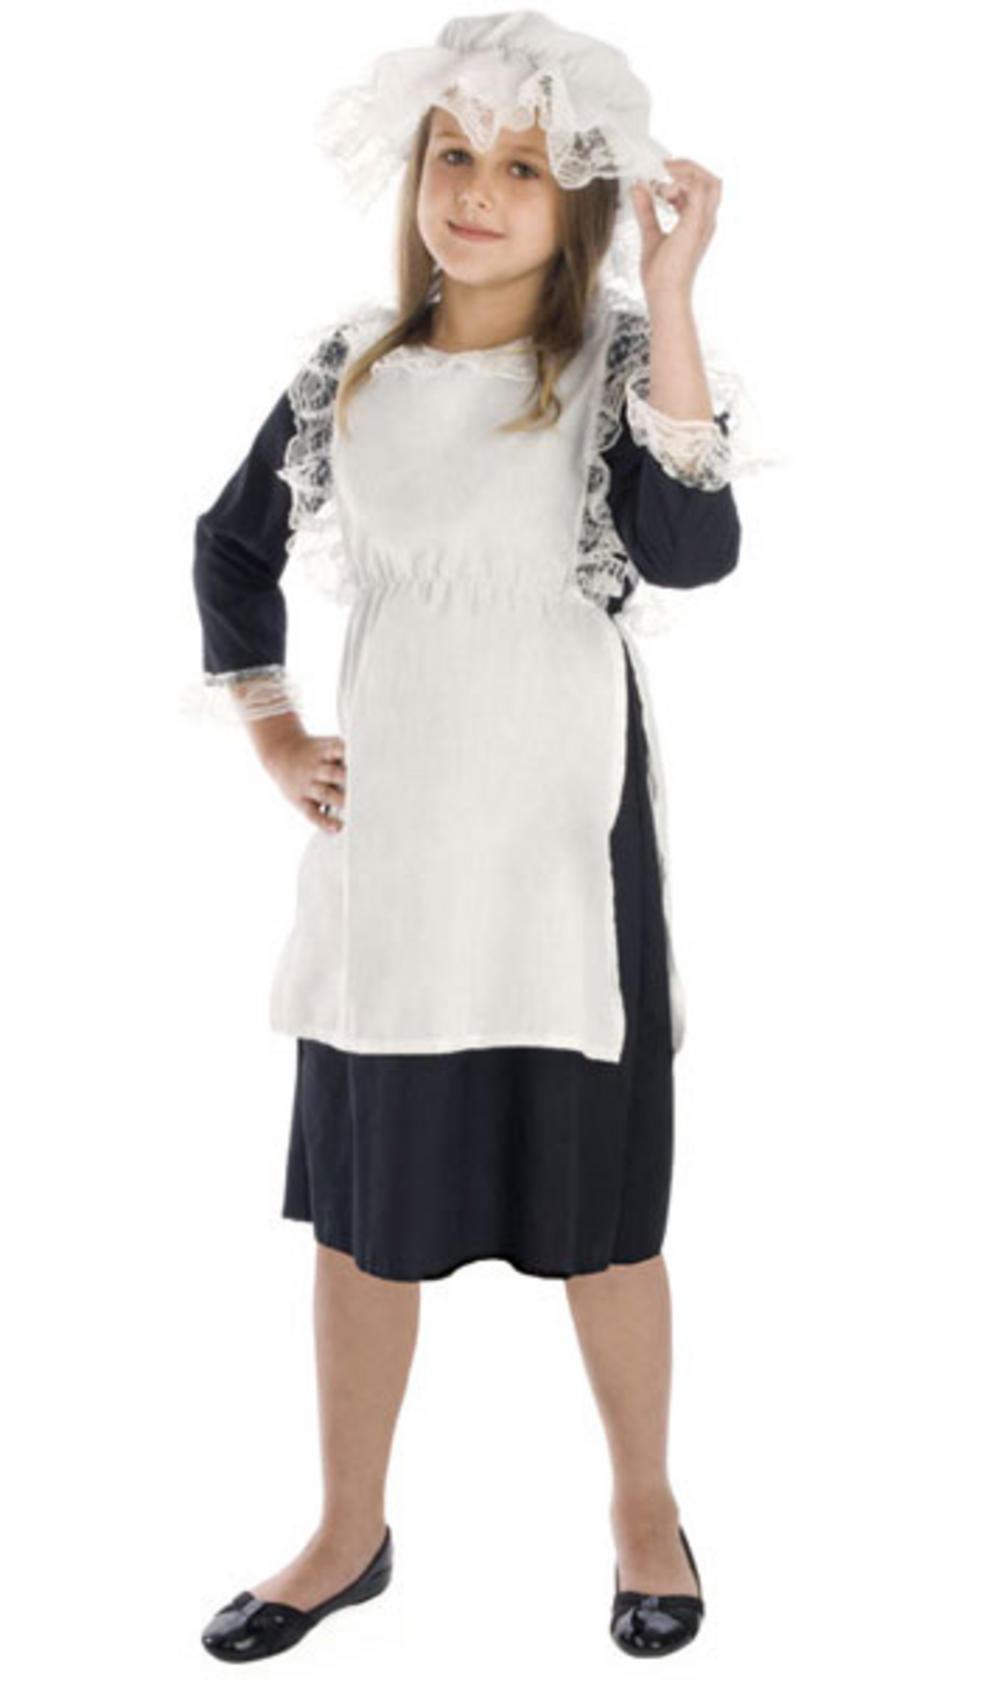 Victorian Girl Costume   Girlu0026#39;s World Book Day Fancy Dress Costumes   Mega Fancy Dress